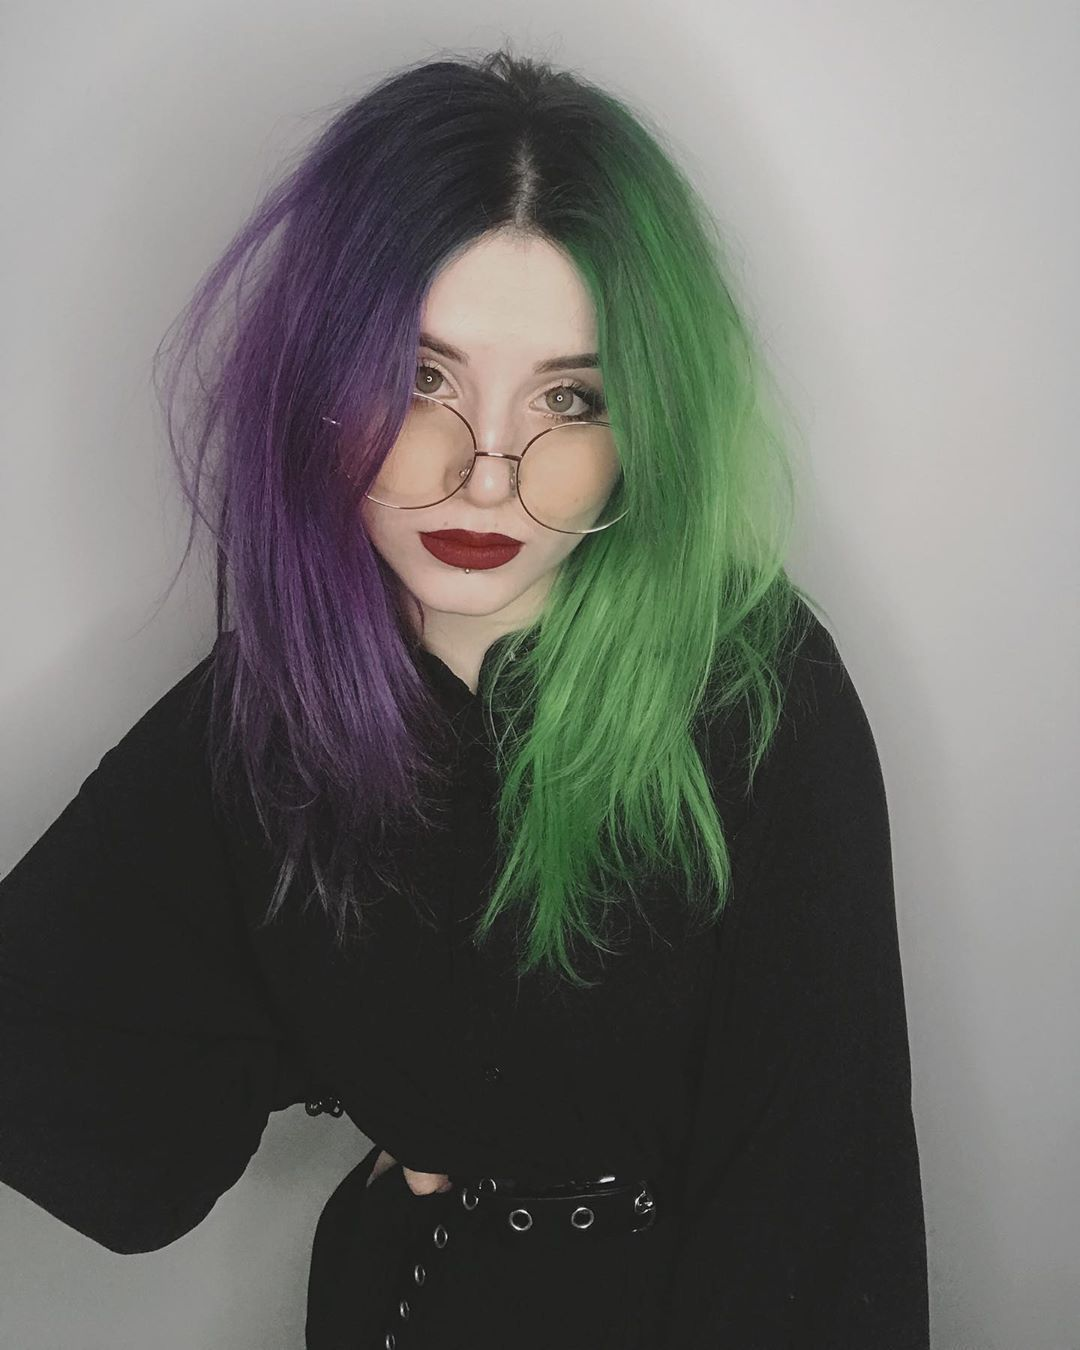 Mais Atualizado Foto Cabelo Coloridos Egirl Sugestoesnika Just On Instagram I Tak Mogu In 2020 Split Dyed Hair Hair Inspo Color Dyed Hair